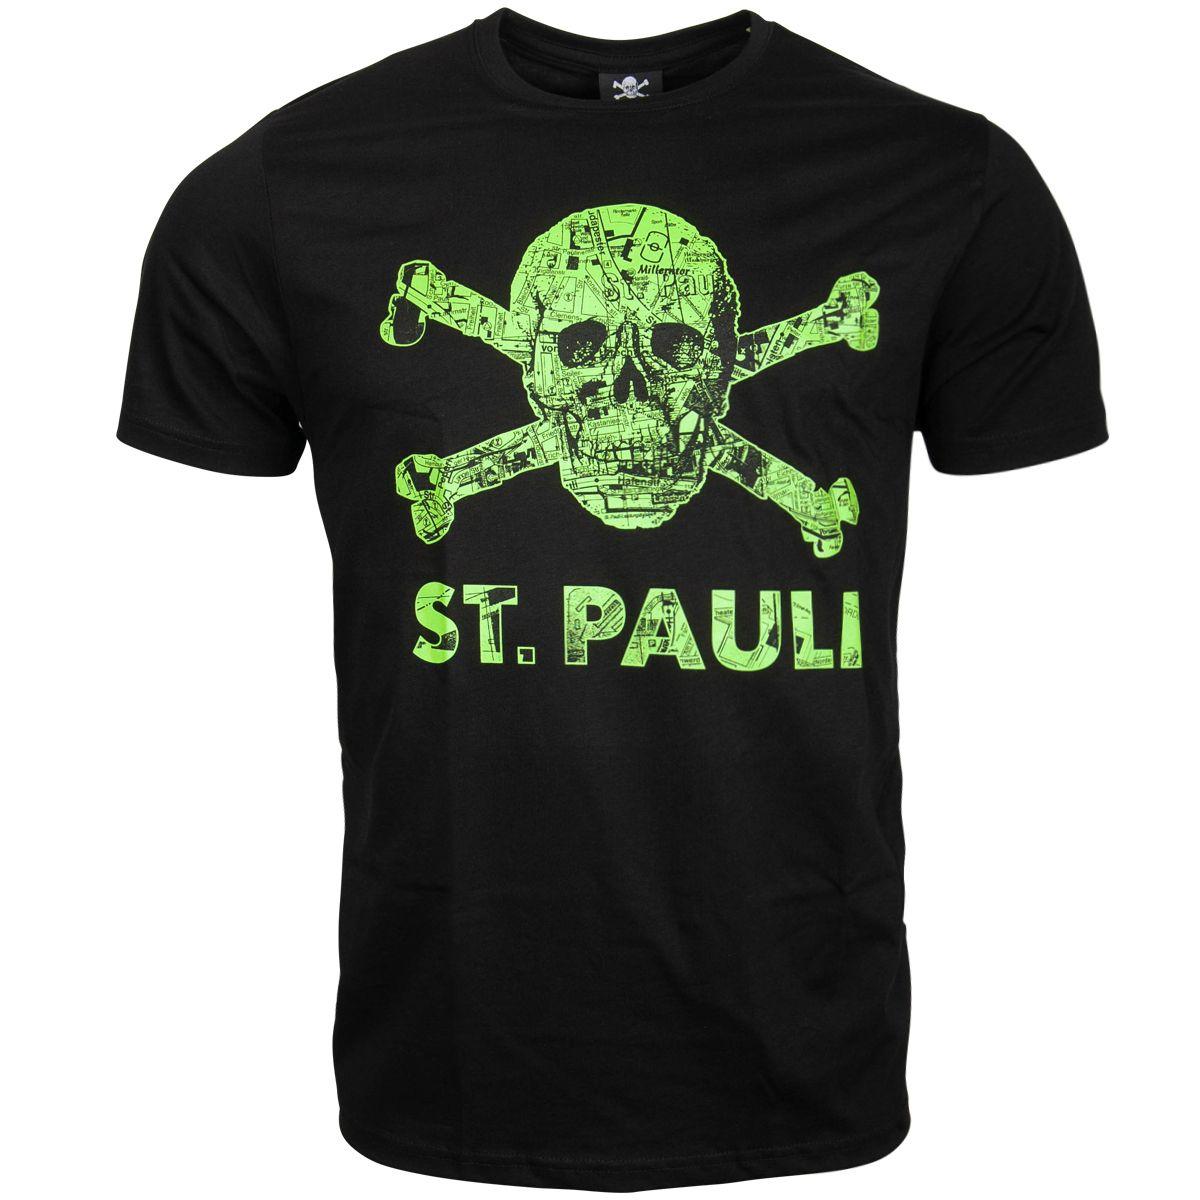 FC St. Pauli - T-Shirt Totenkopf Stadtplan Schwarz-Grün - schwarz